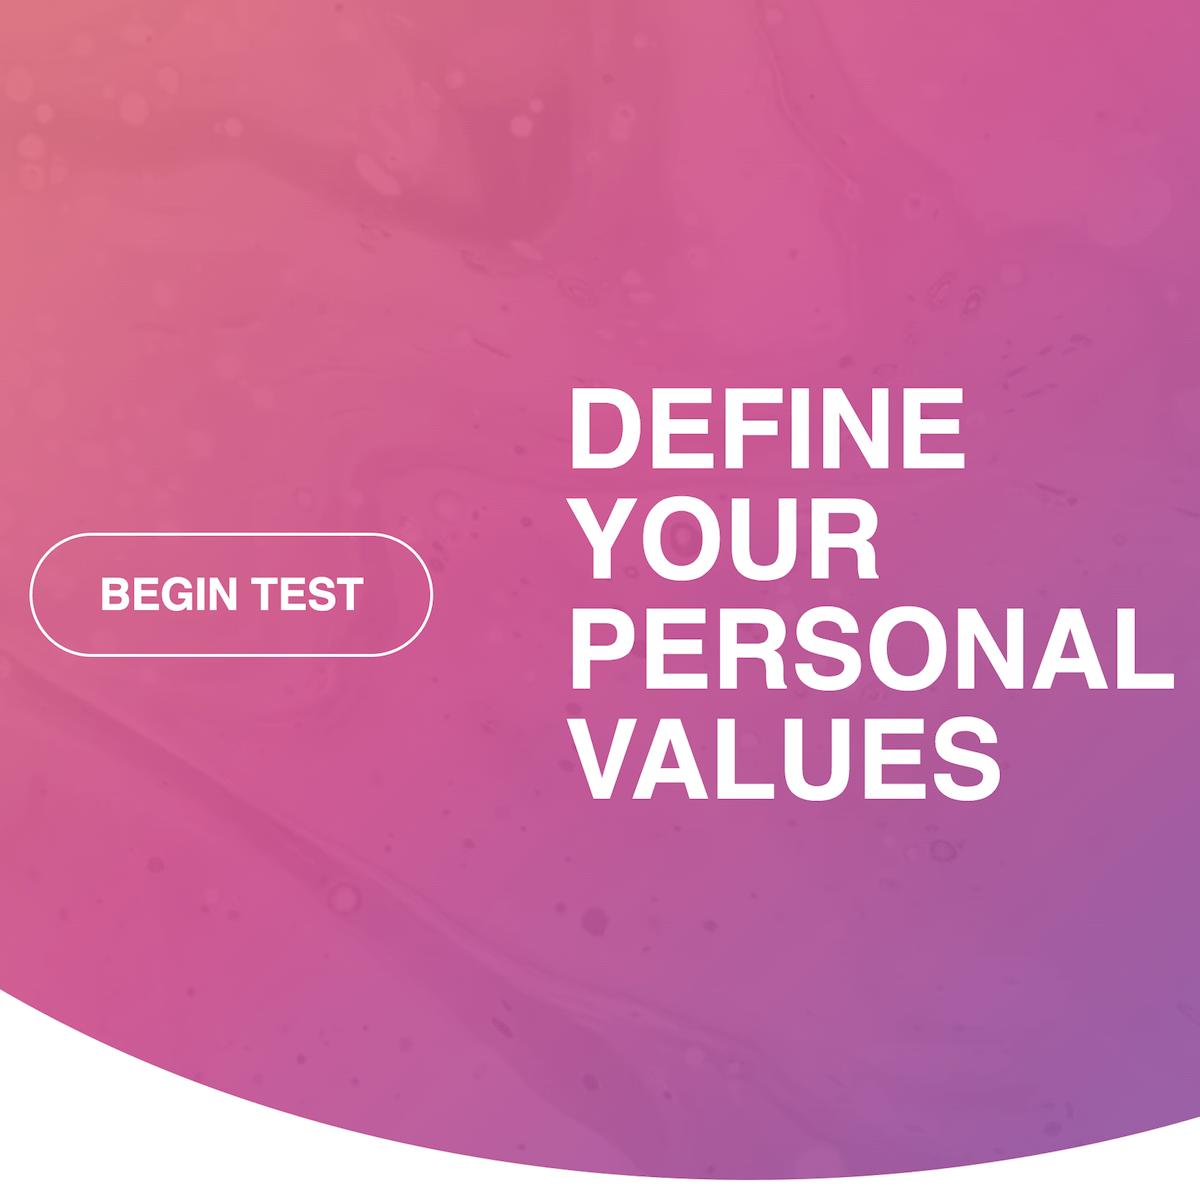 Values top personal Core Values